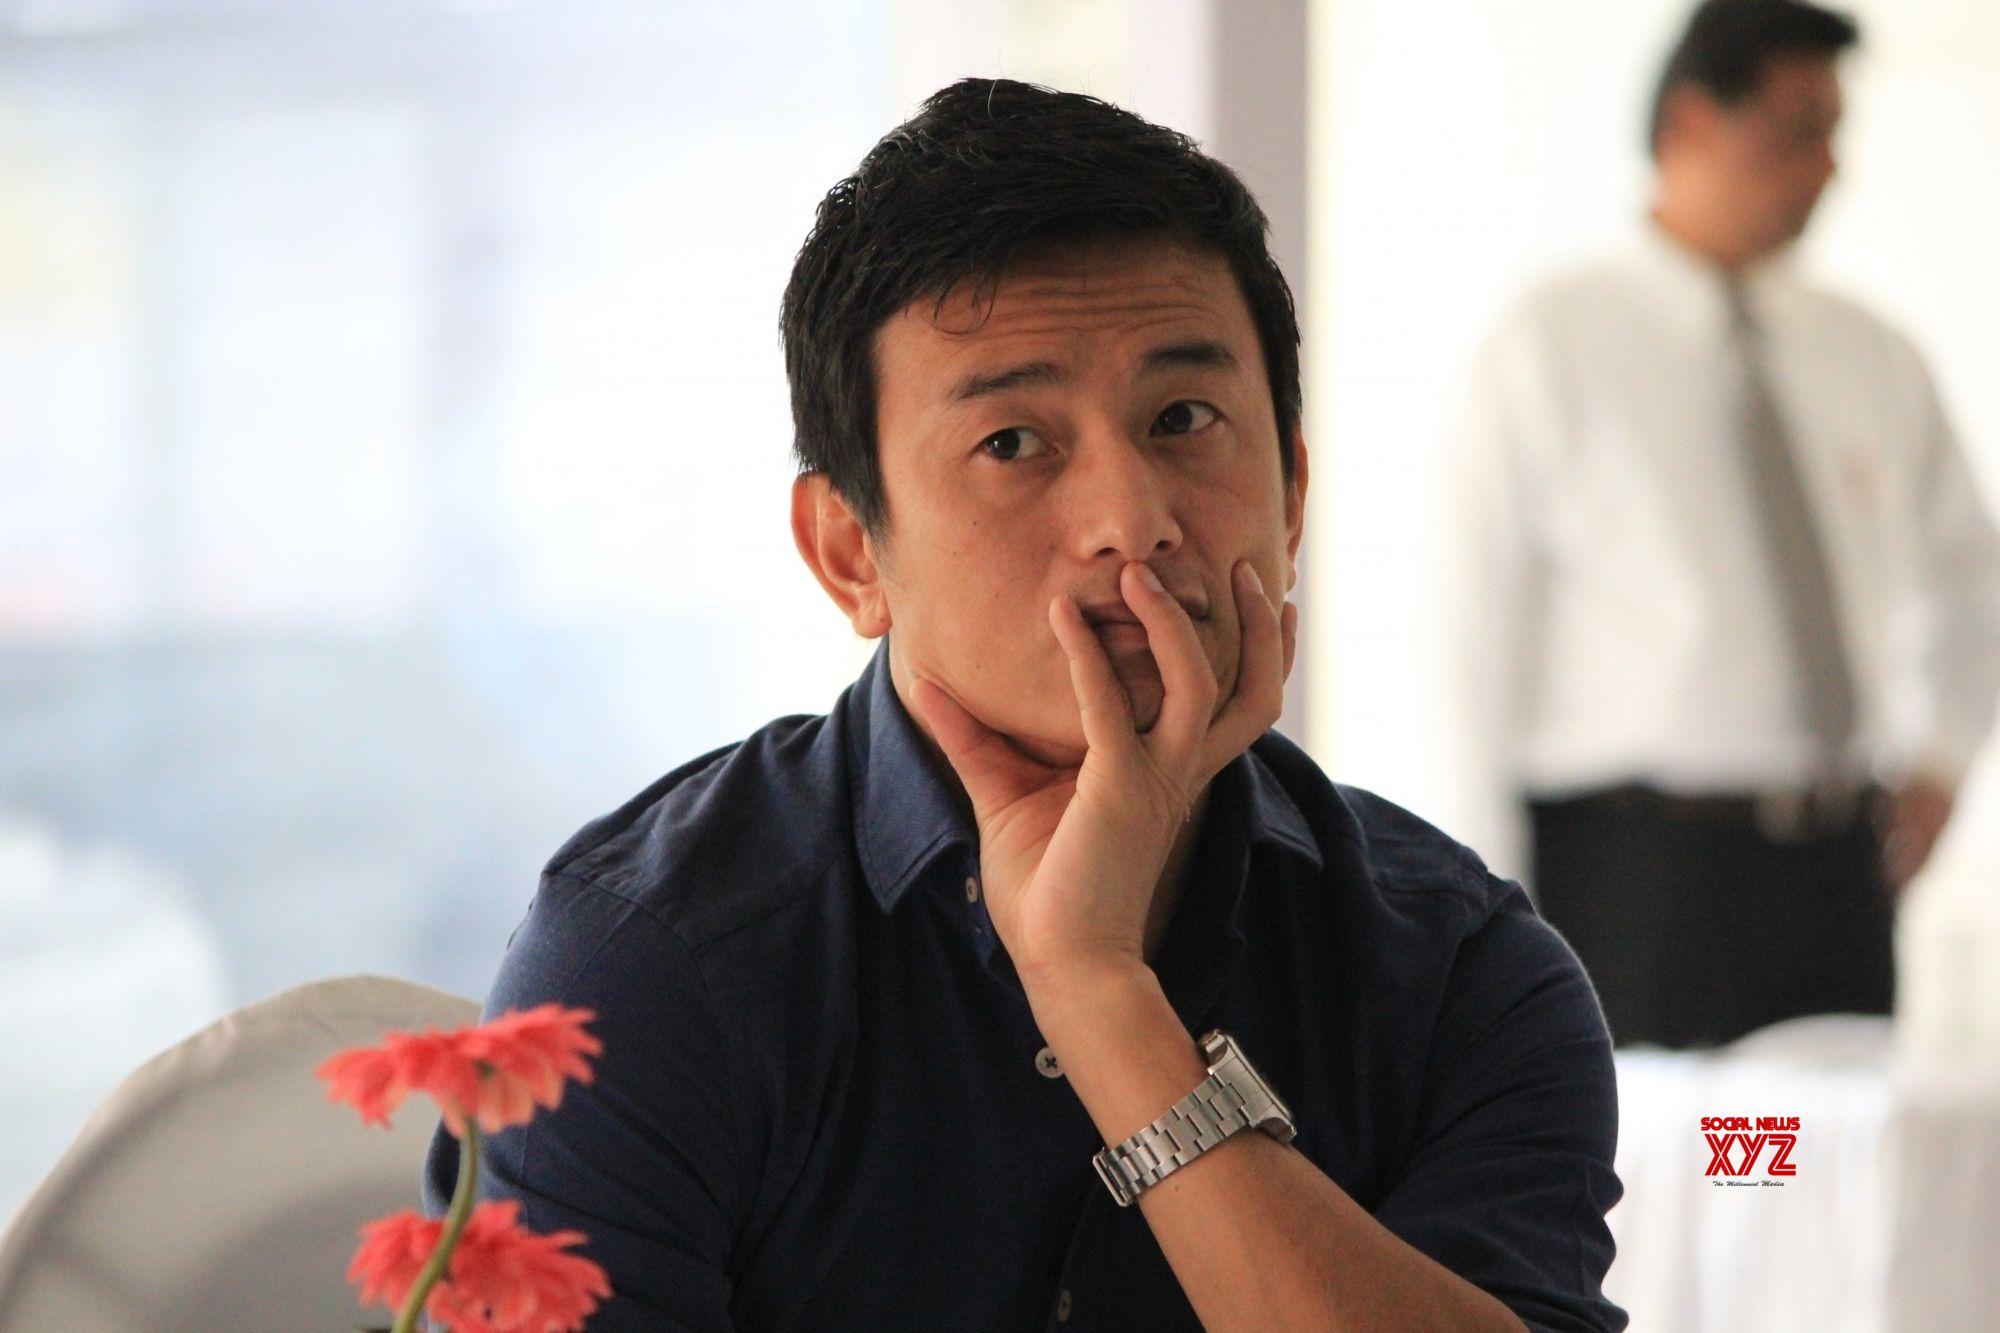 Had advised Sanjiv Goenka to buy Mohun Bagan: Bhutia